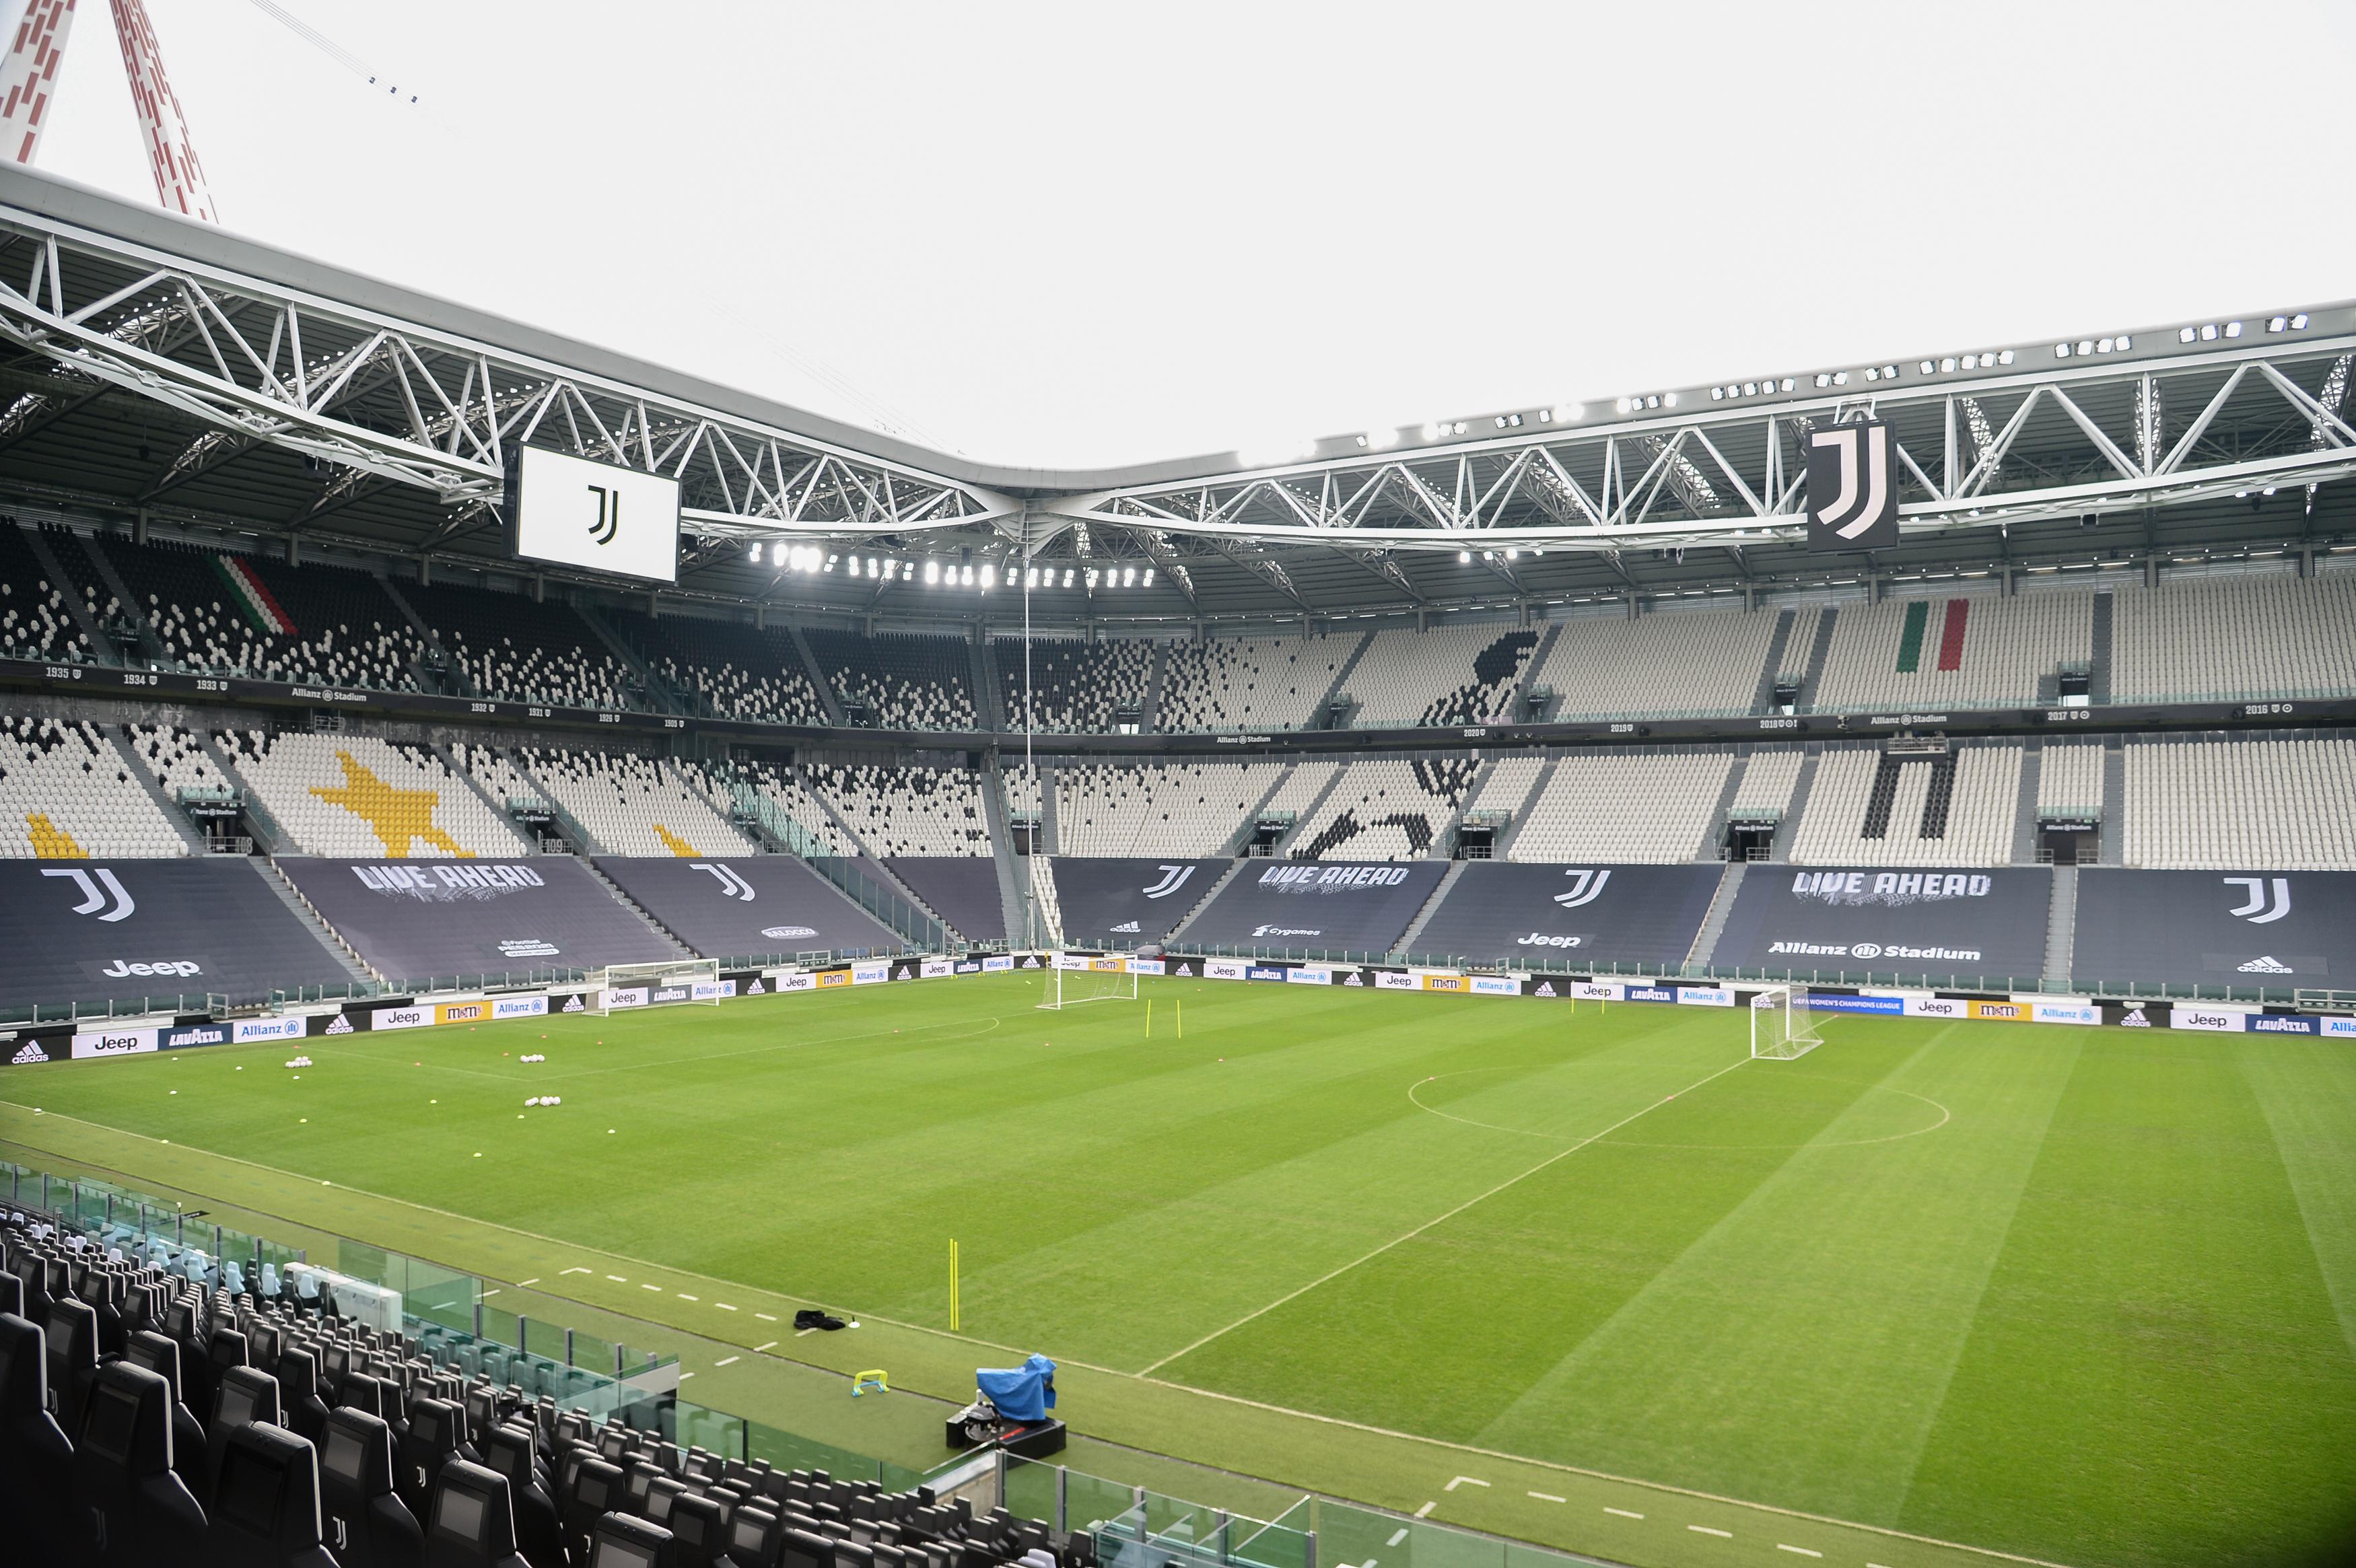 Olympique Lyonnais - Training Session??